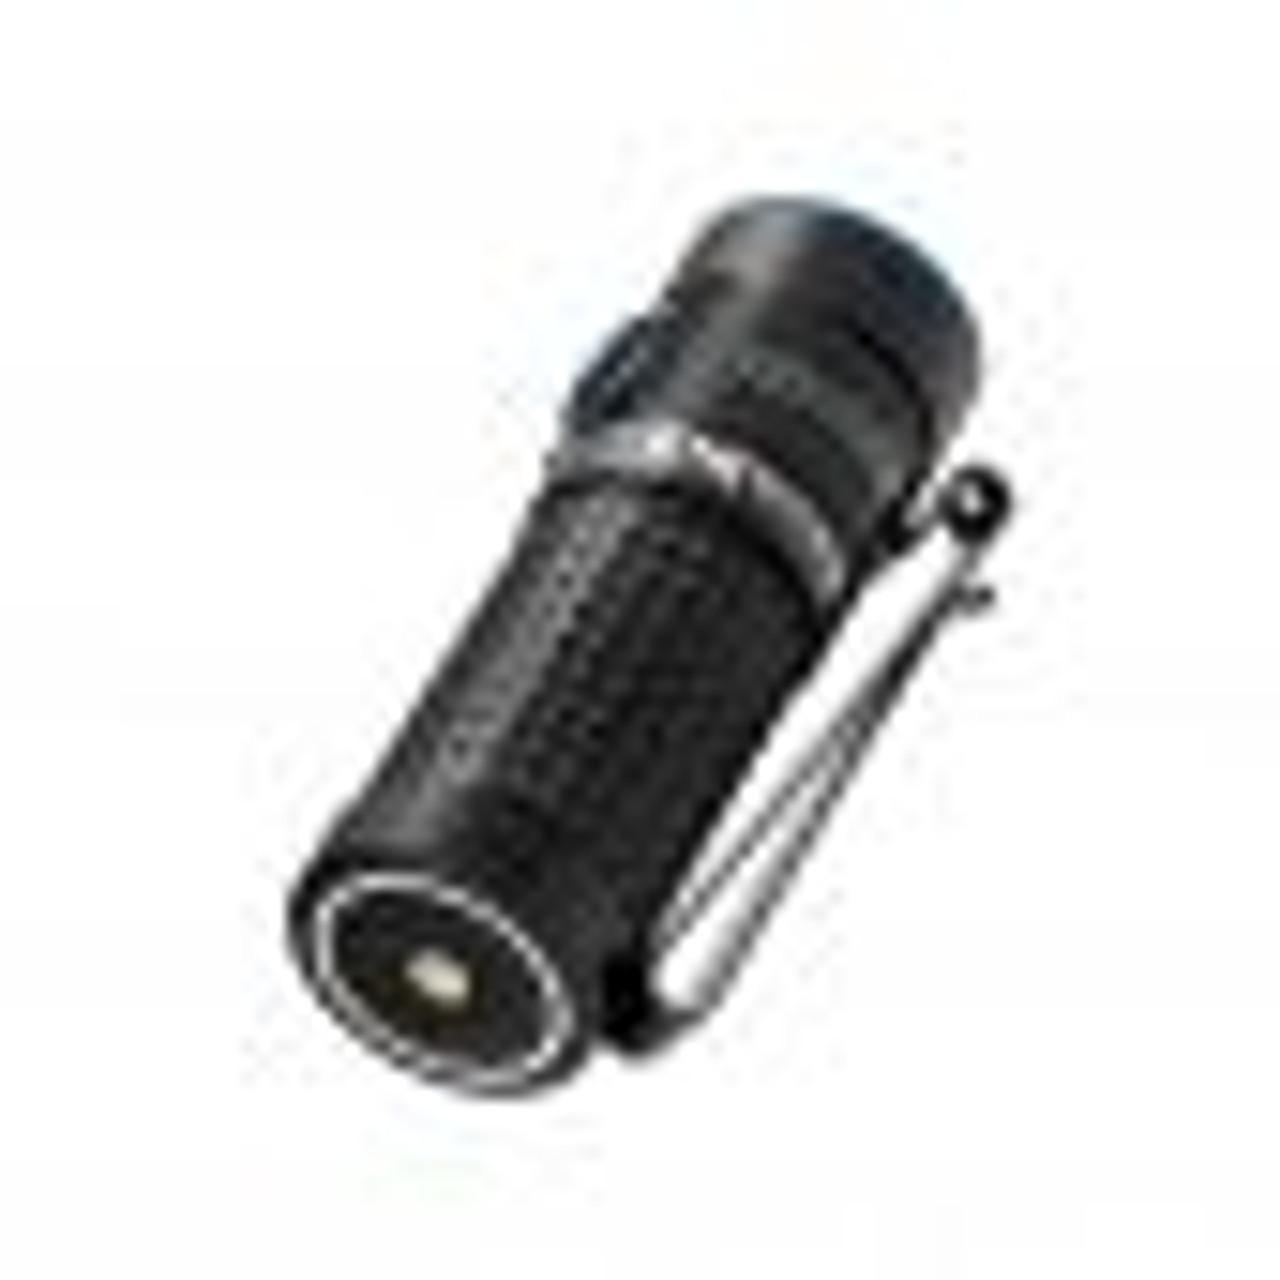 Olight S1R Baton II